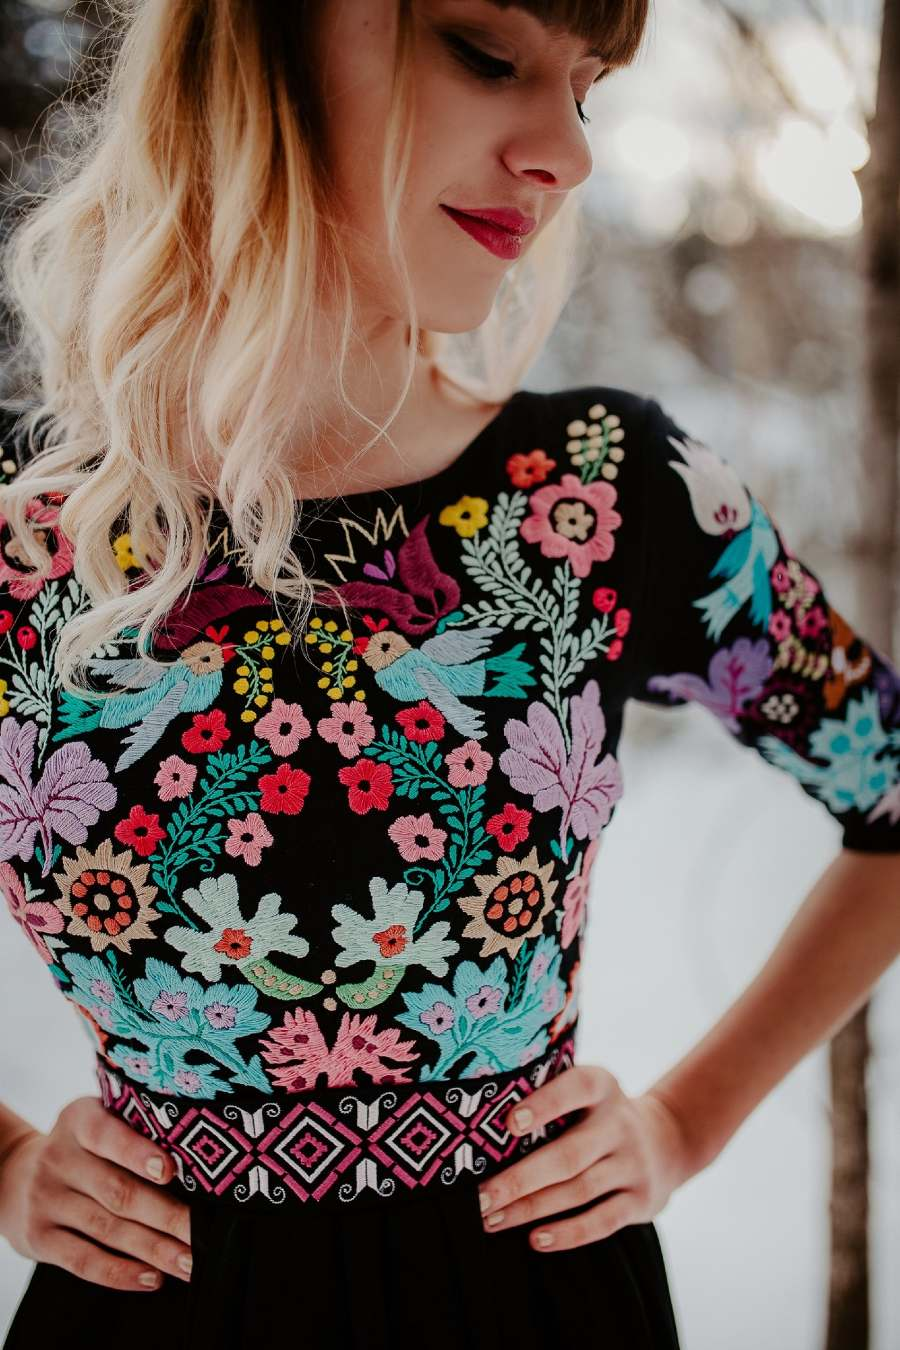 Jaroslava-Wurll-Kocanova-Multicolored-Floral-Embroidery